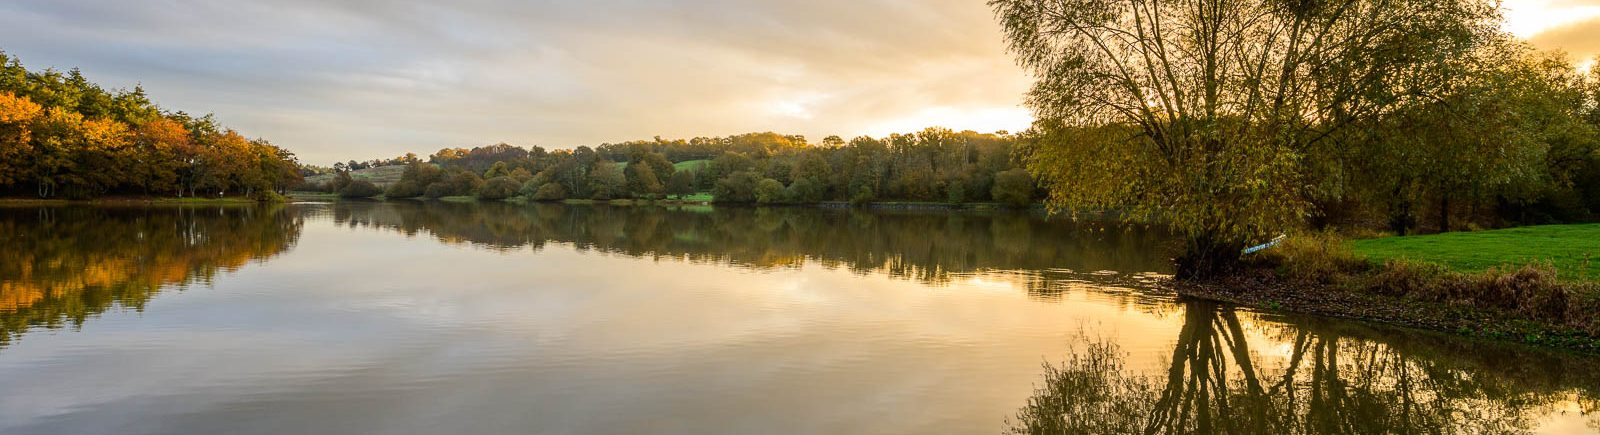 Lac du Jaunay 2